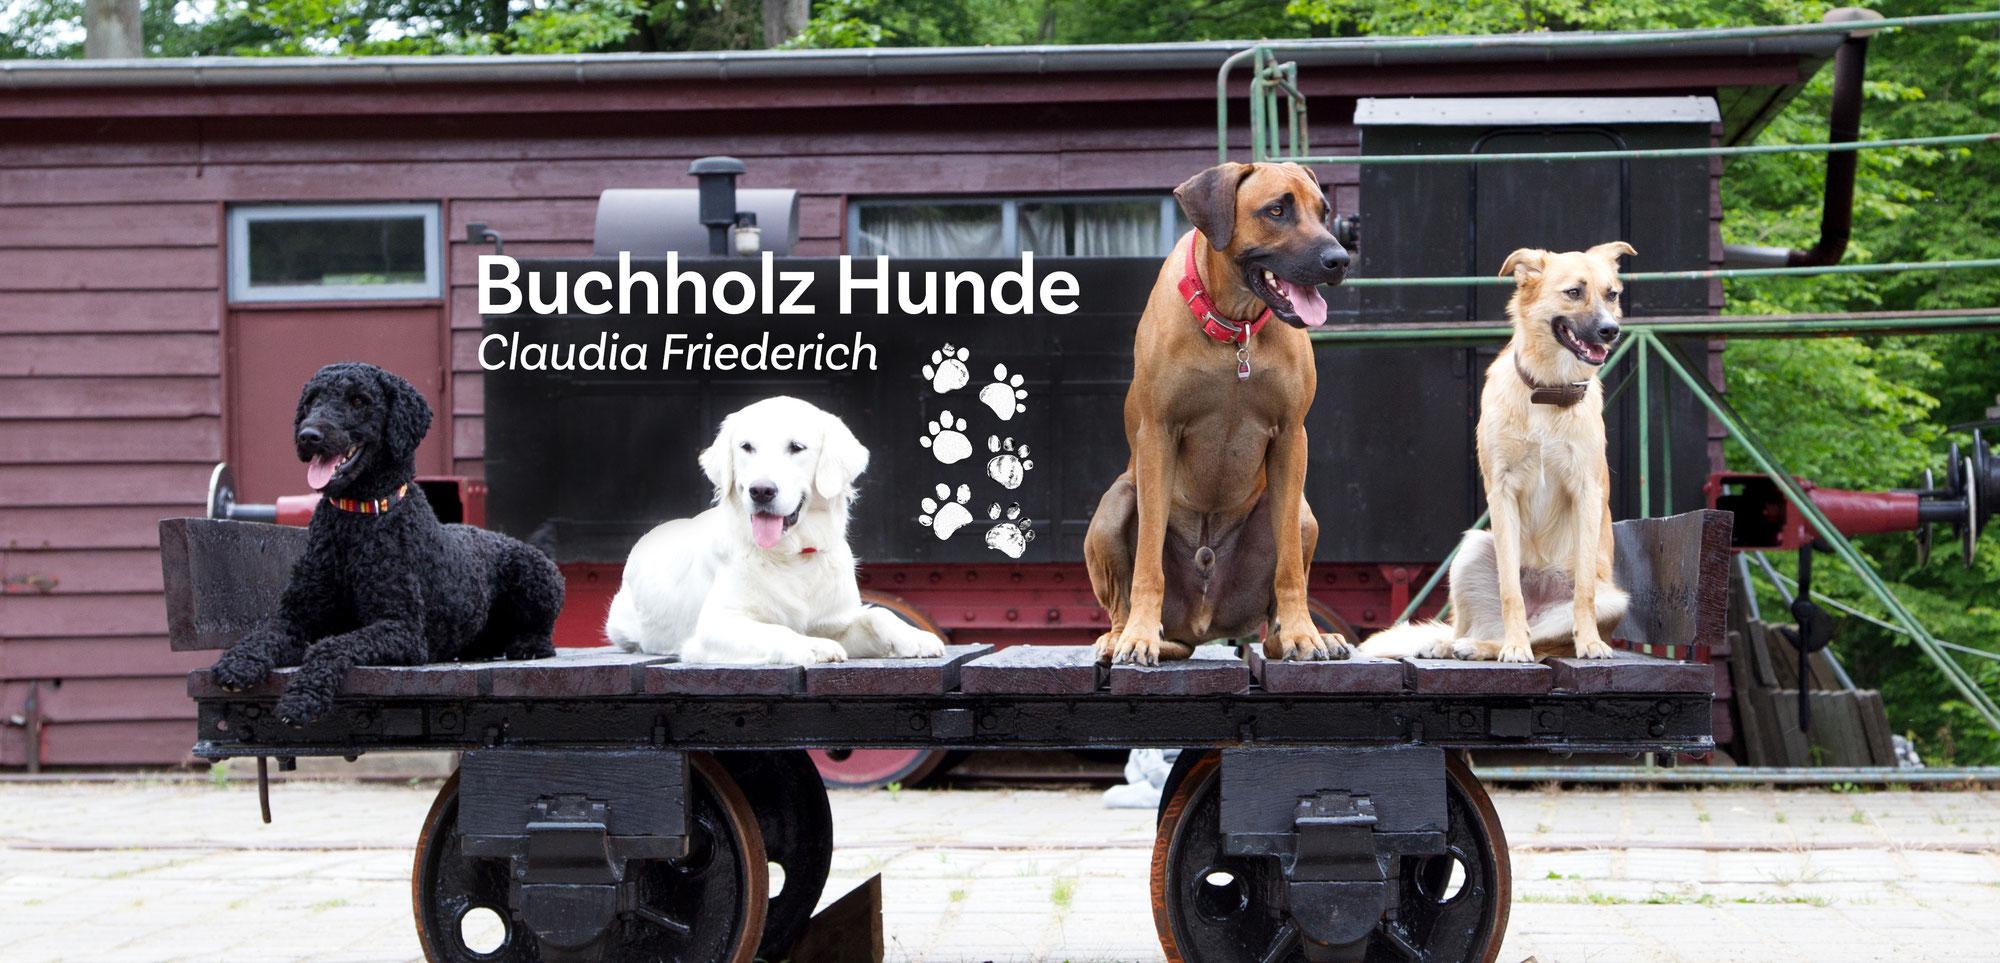 (c) Buchholz-hunde.de